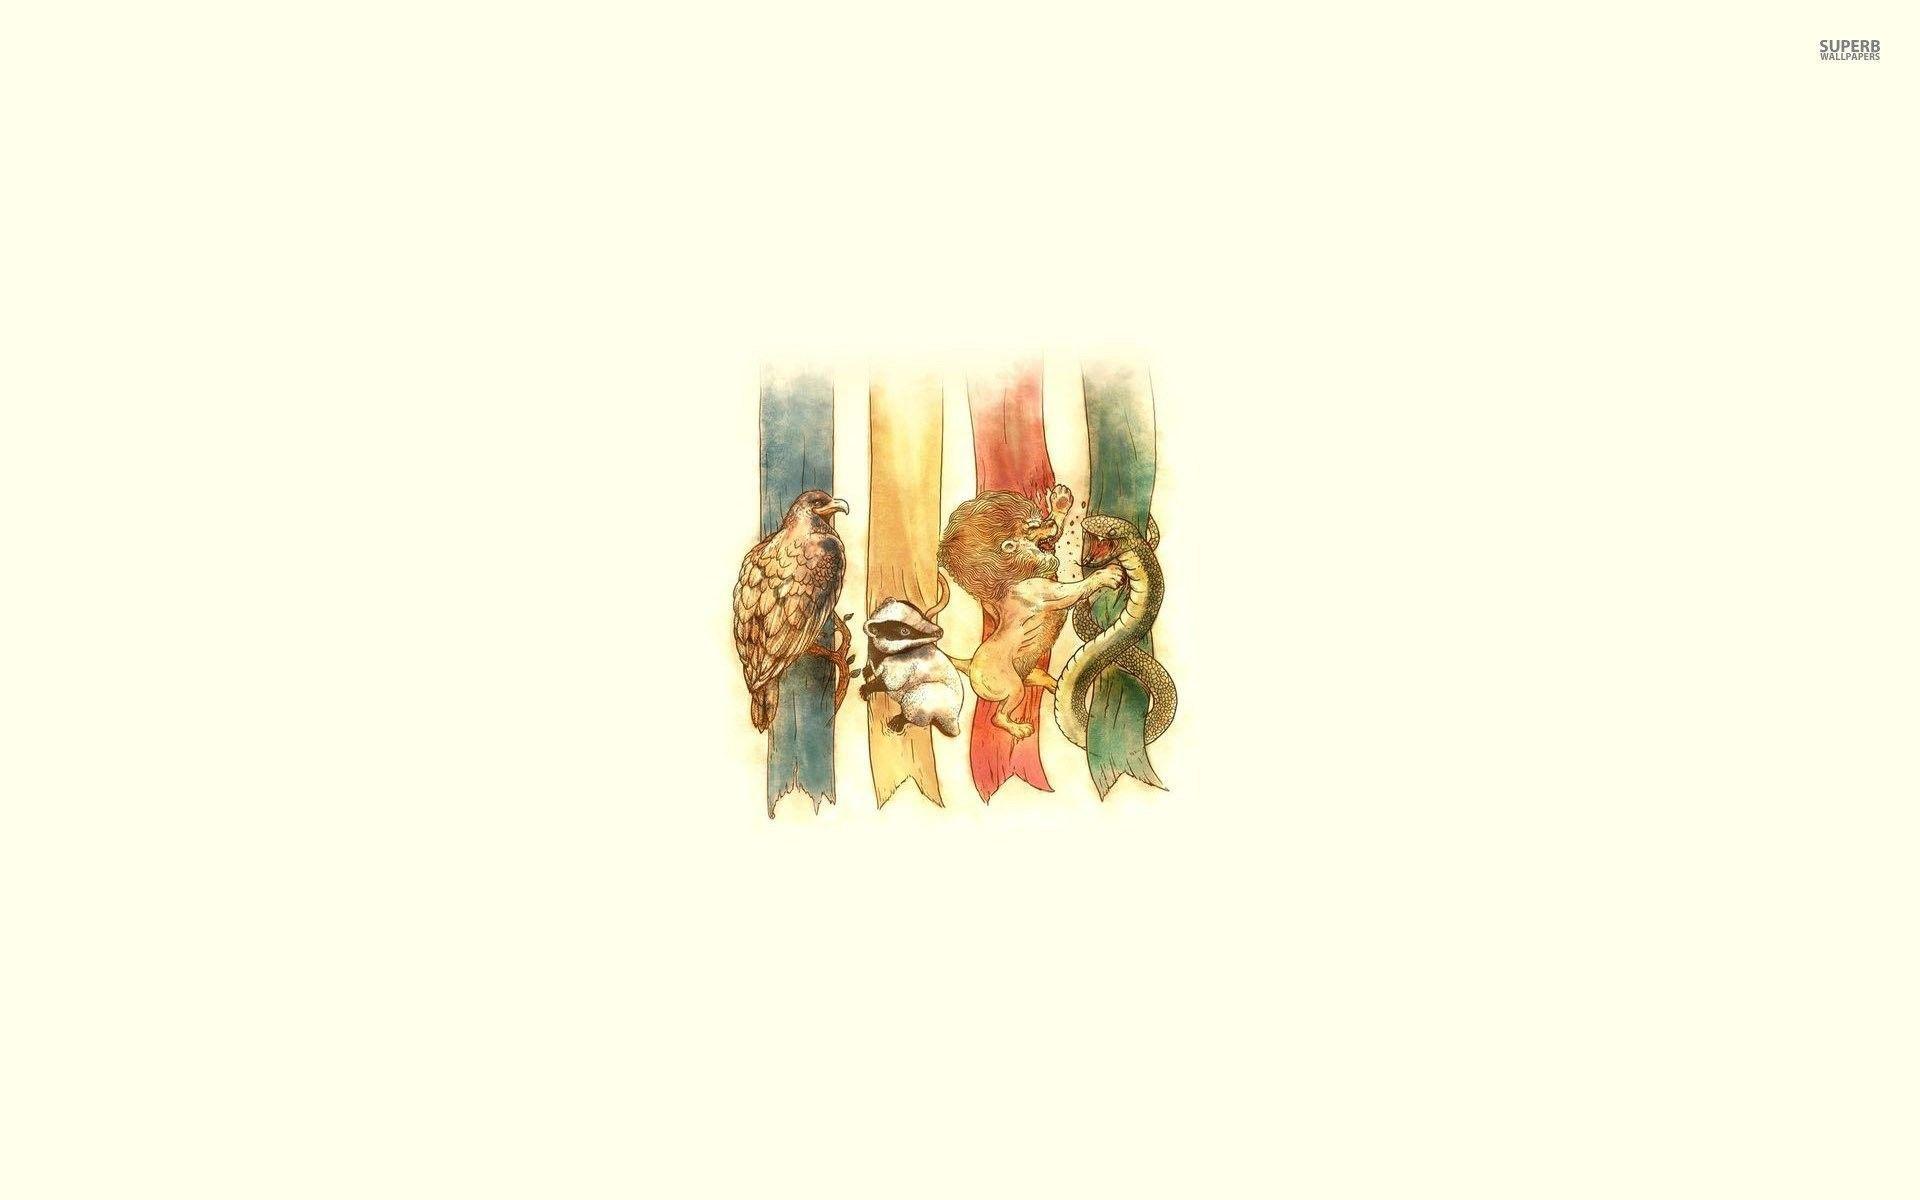 Minimalist Harry Potter Desktop HD Wallpapers - Wallpaper Cave